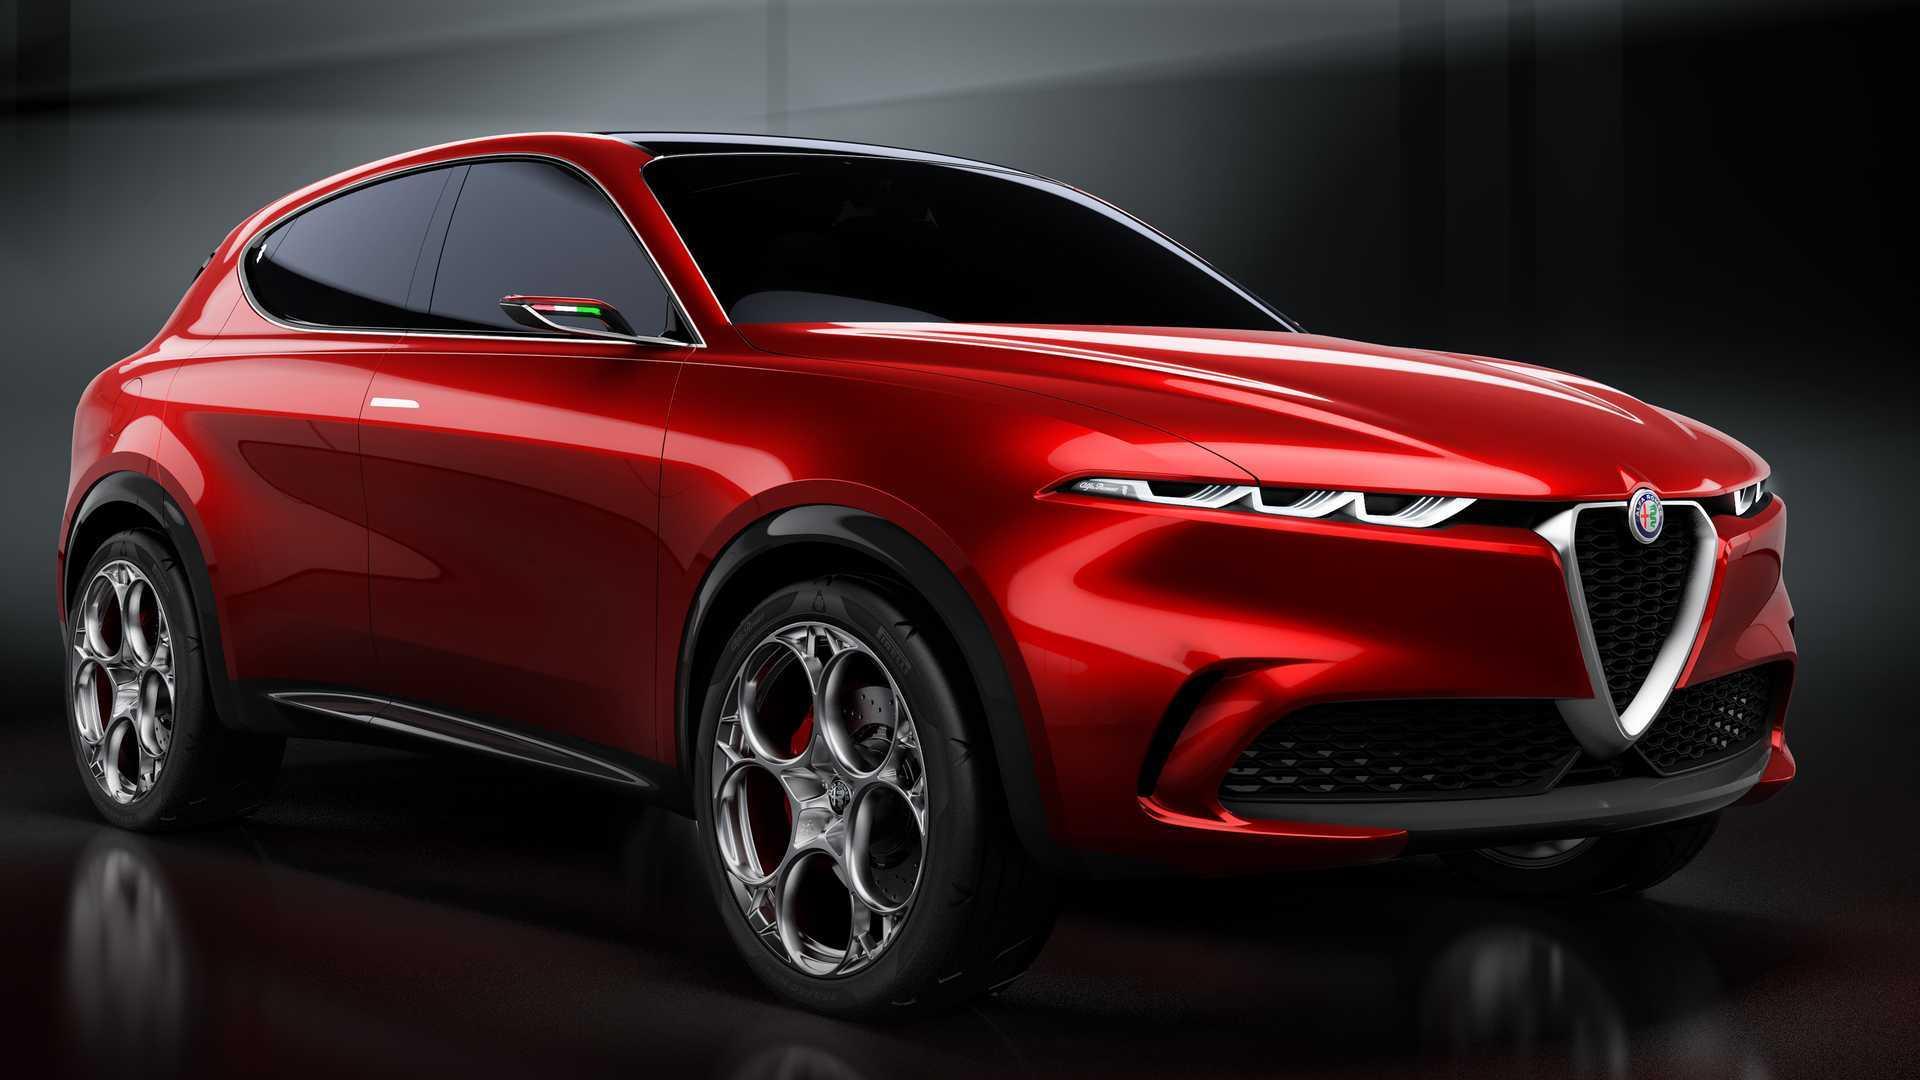 BMW MINI MK2 CONVERTIBLE INSPIRED CAR T-SHIRT CHOOSE FROM 6 COLOURS S-XXXL